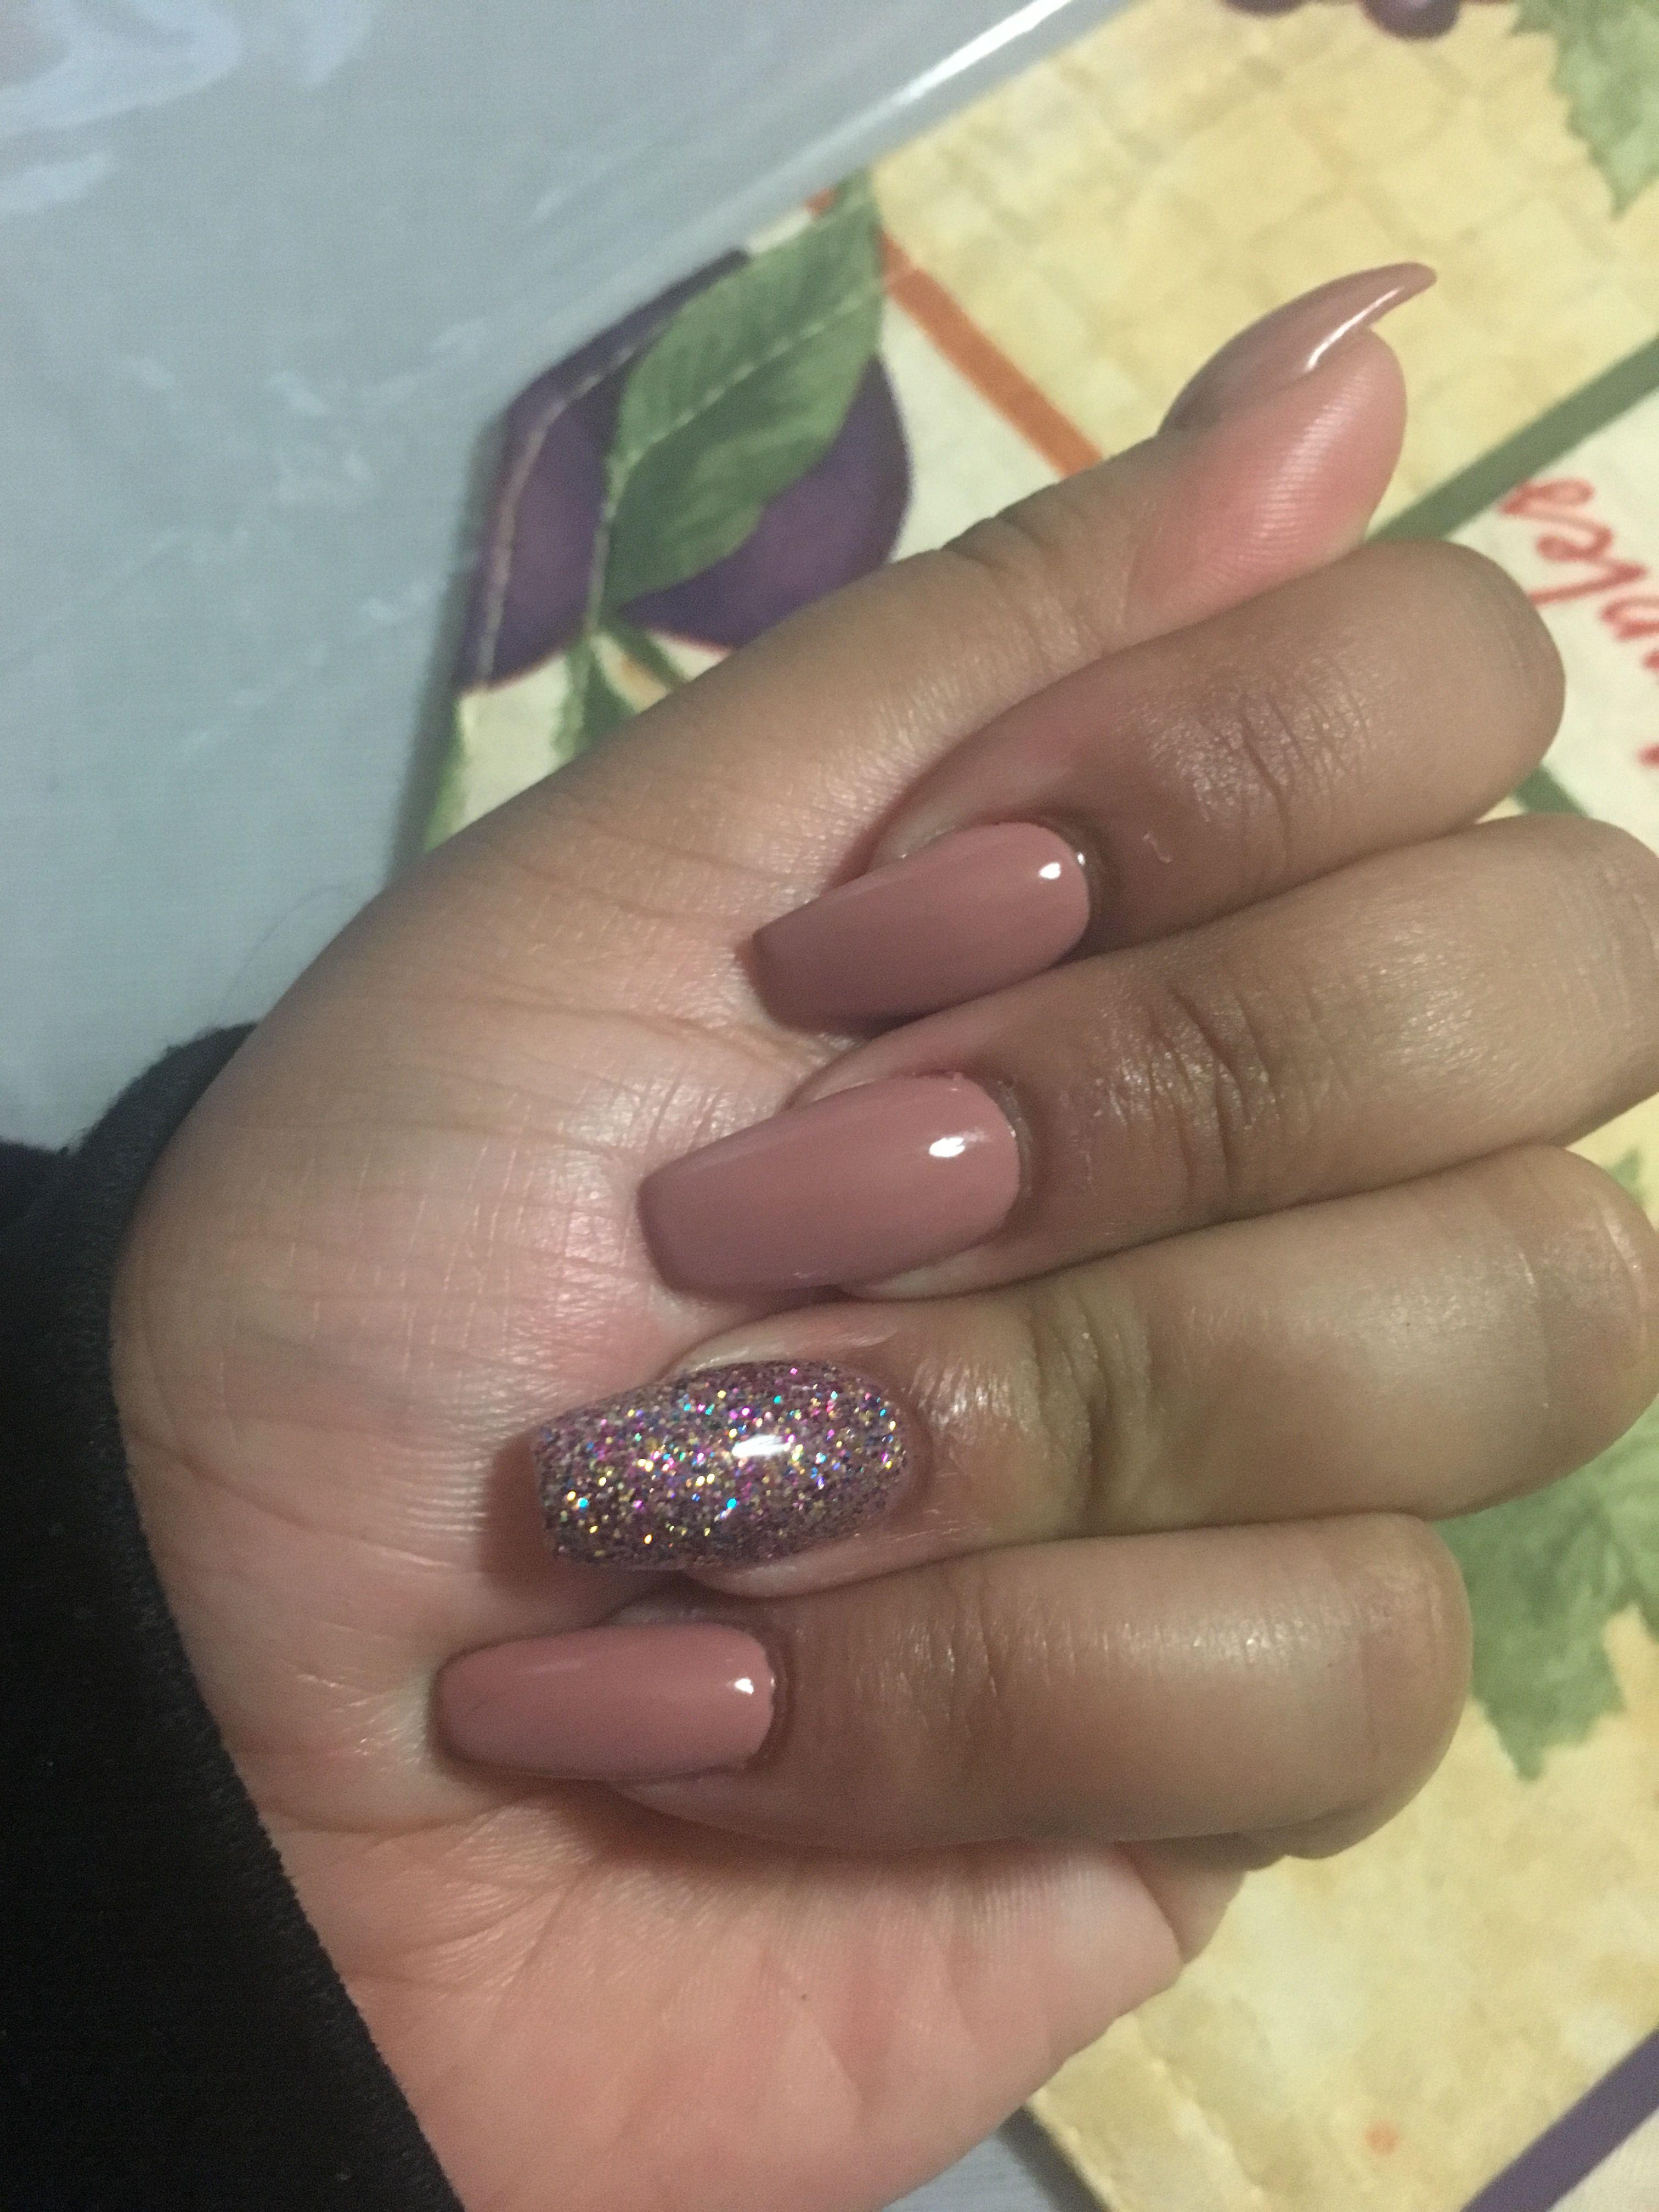 Coffin shape nails - gel | Nails | Pinterest